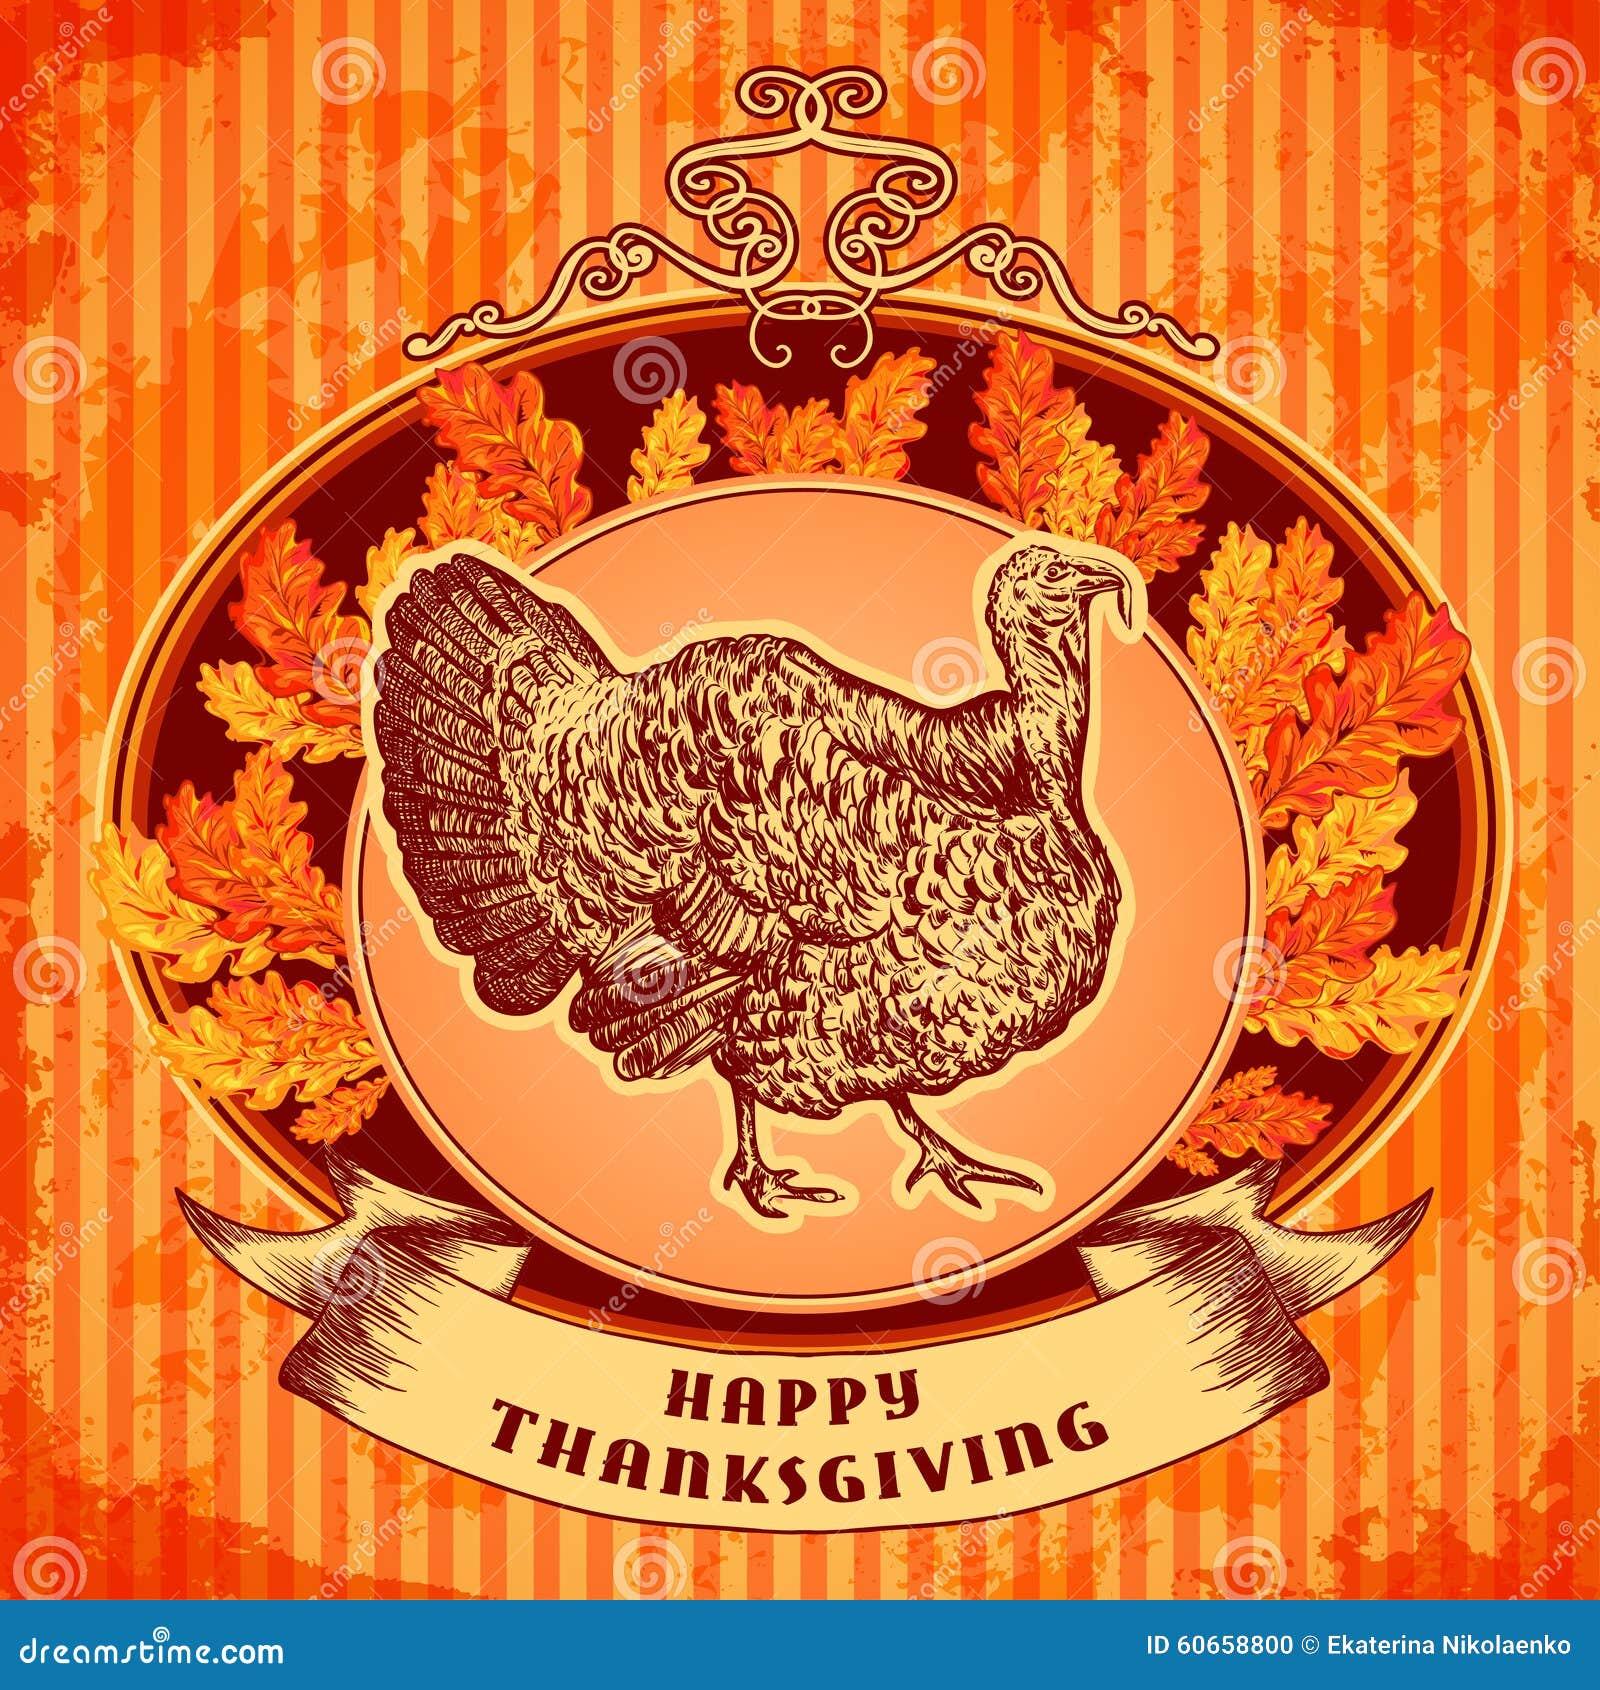 Vintage Thanksgiving Stock Illustrations 23 139 Vintage Thanksgiving Stock Illustrations Vectors Clipart Dreamstime